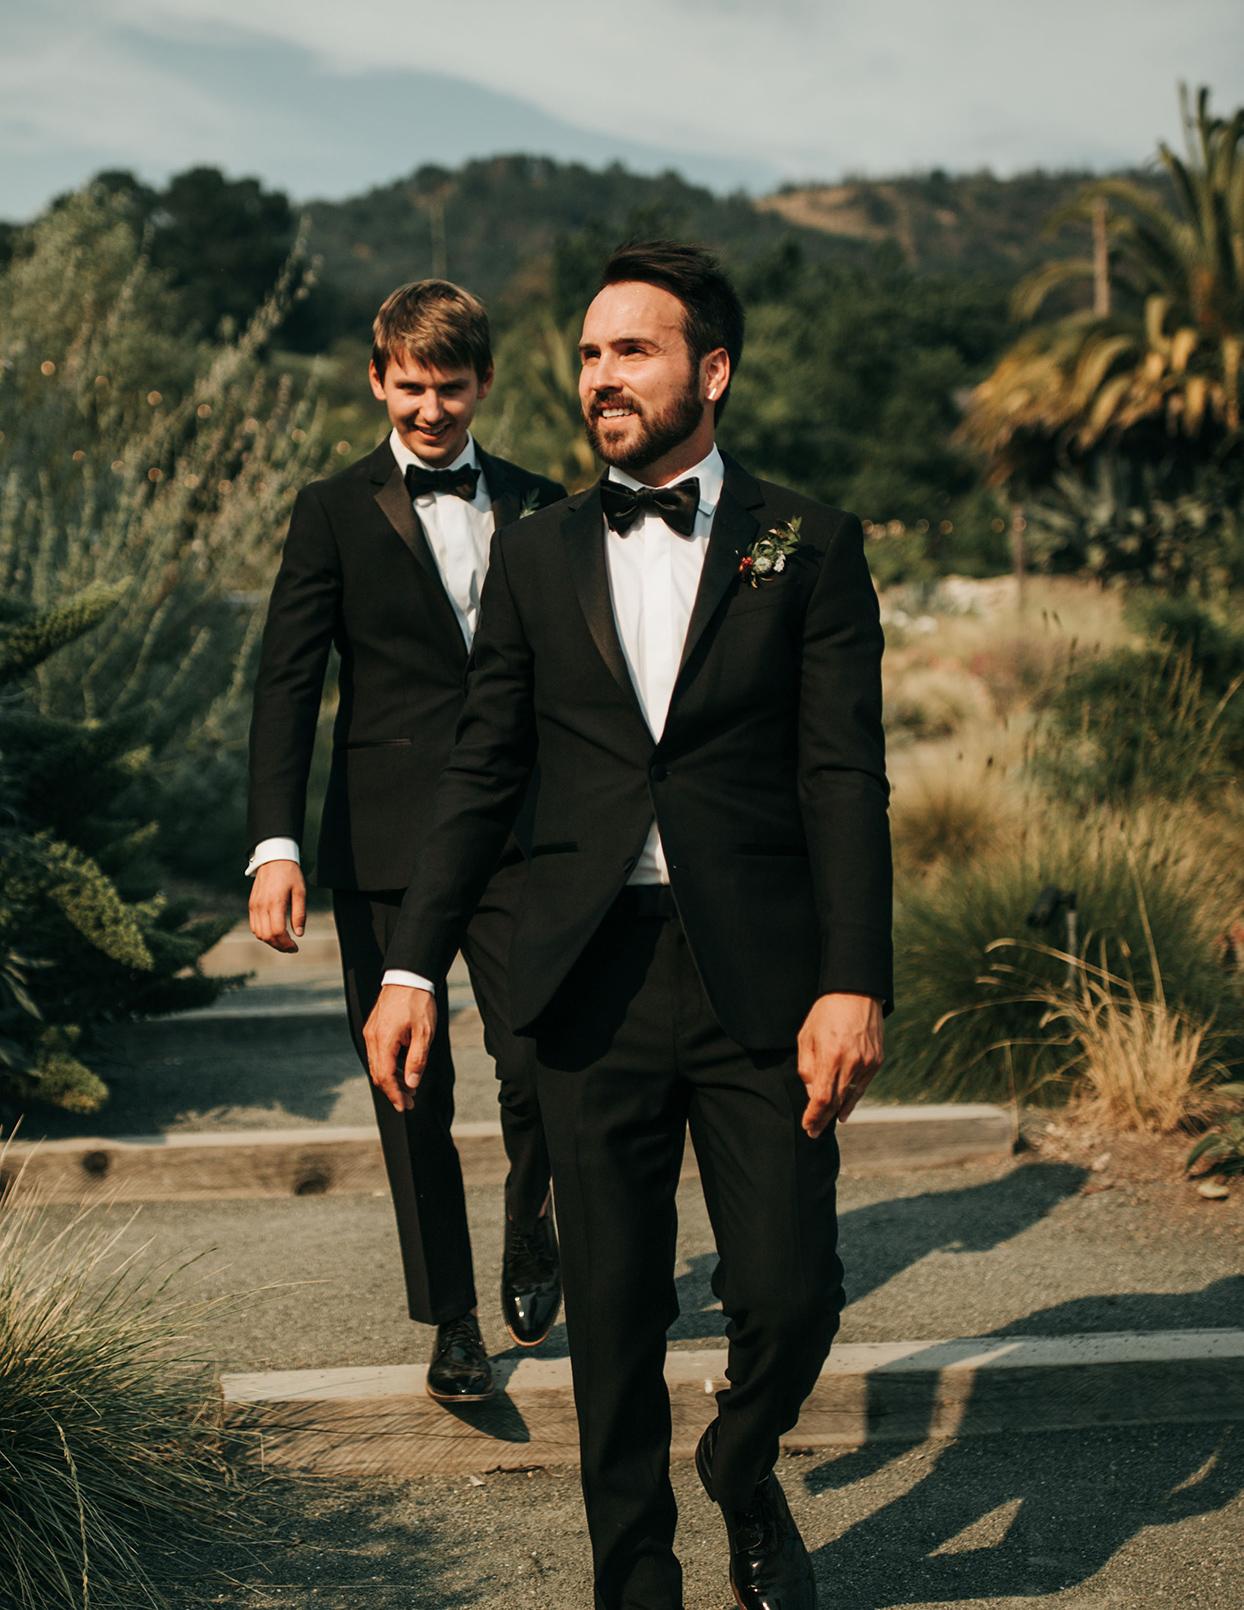 austin alex wedding grooms in black tuxes